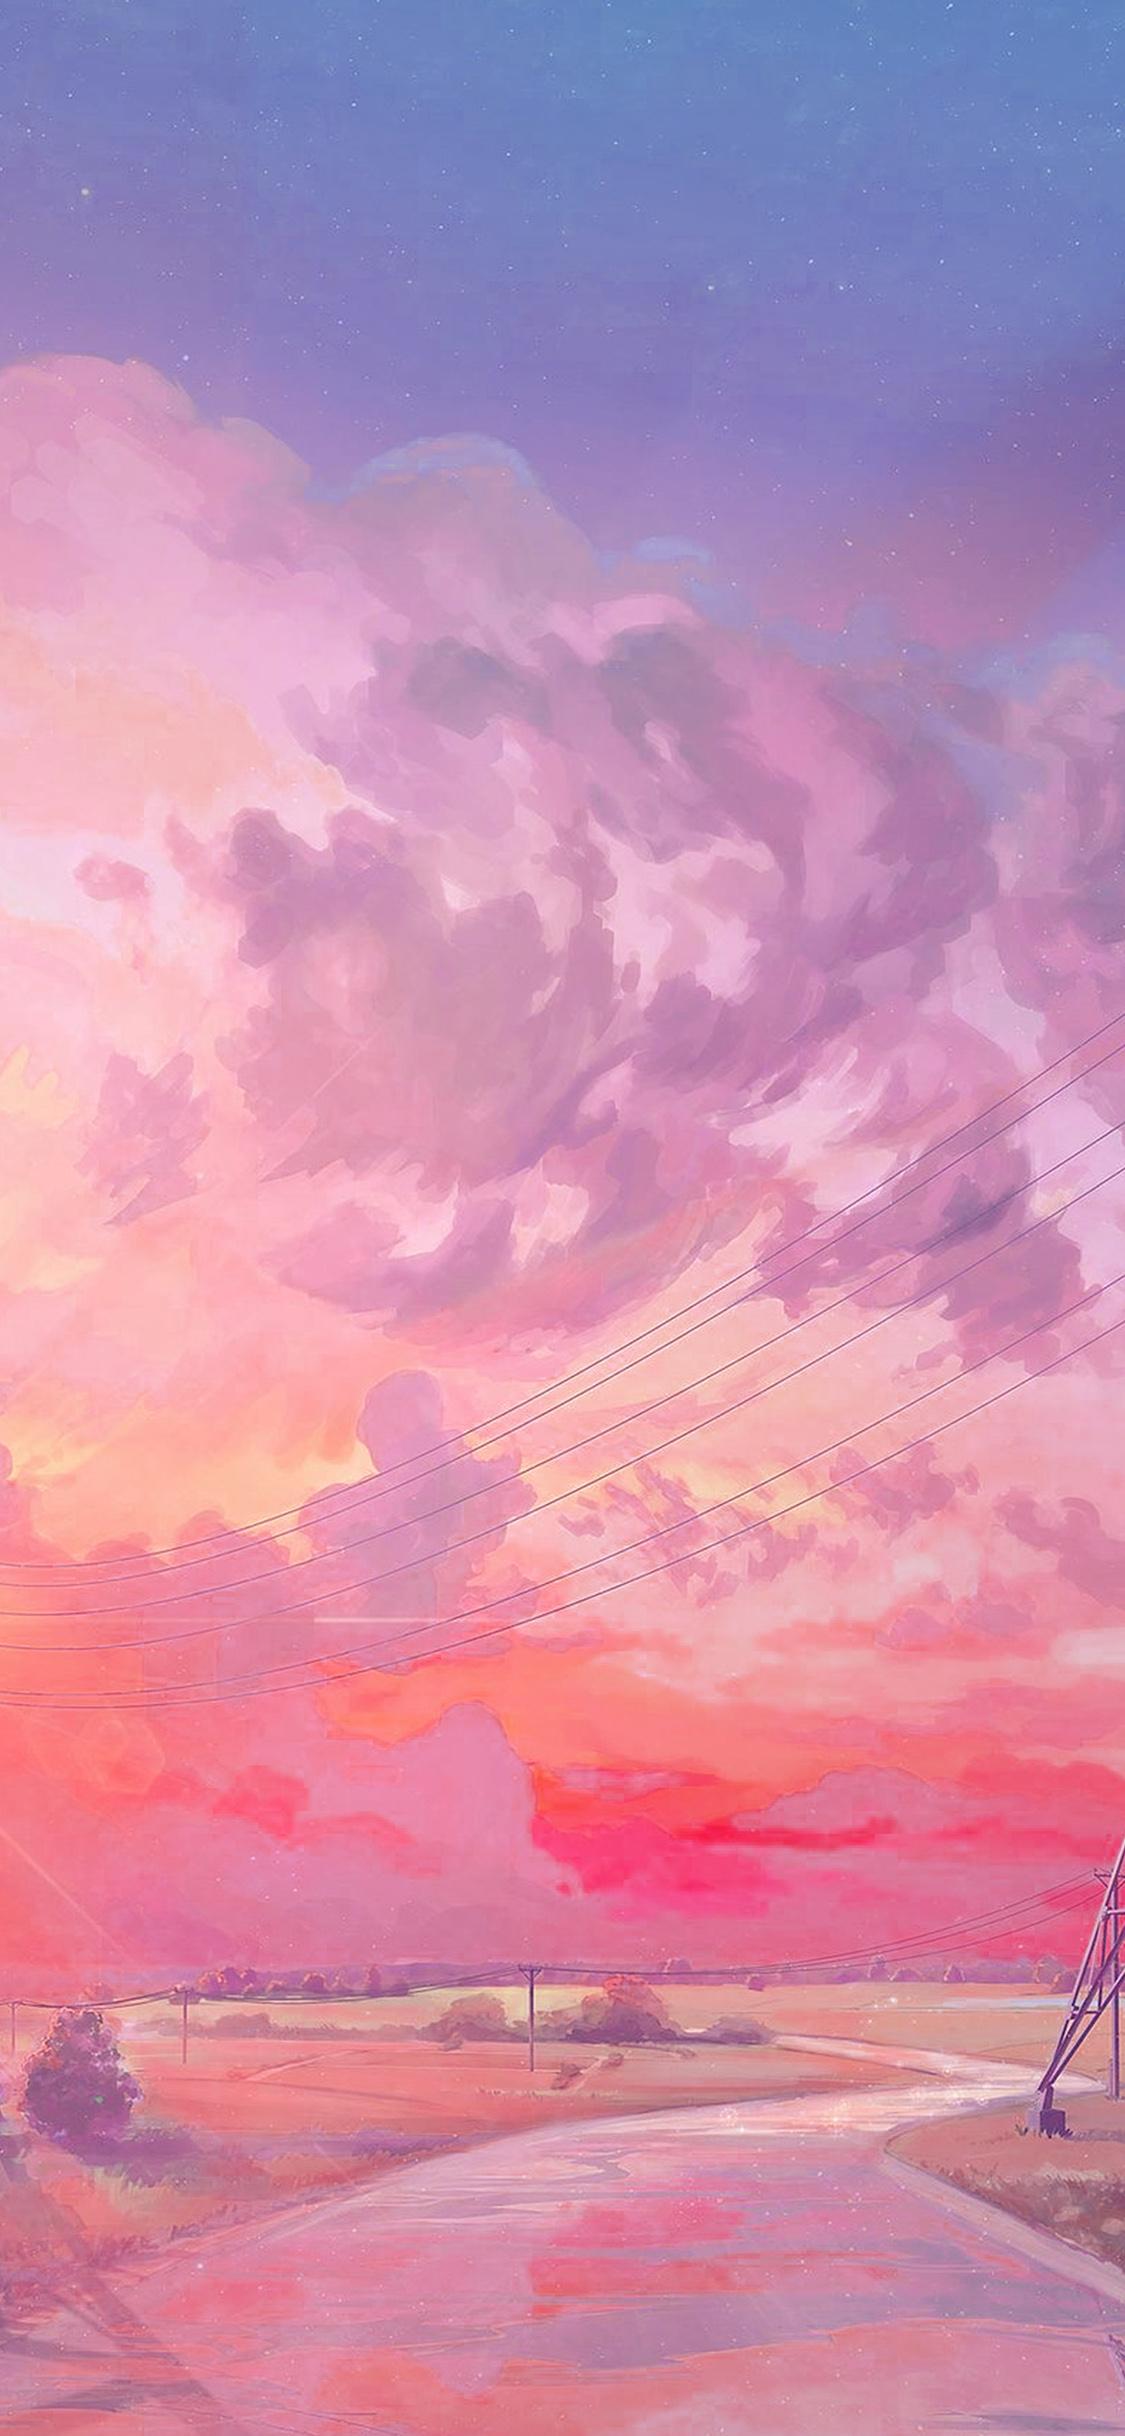 Iphonexpapers Com Iphone X Wallpaper Az42 Arseniy Chebynkin